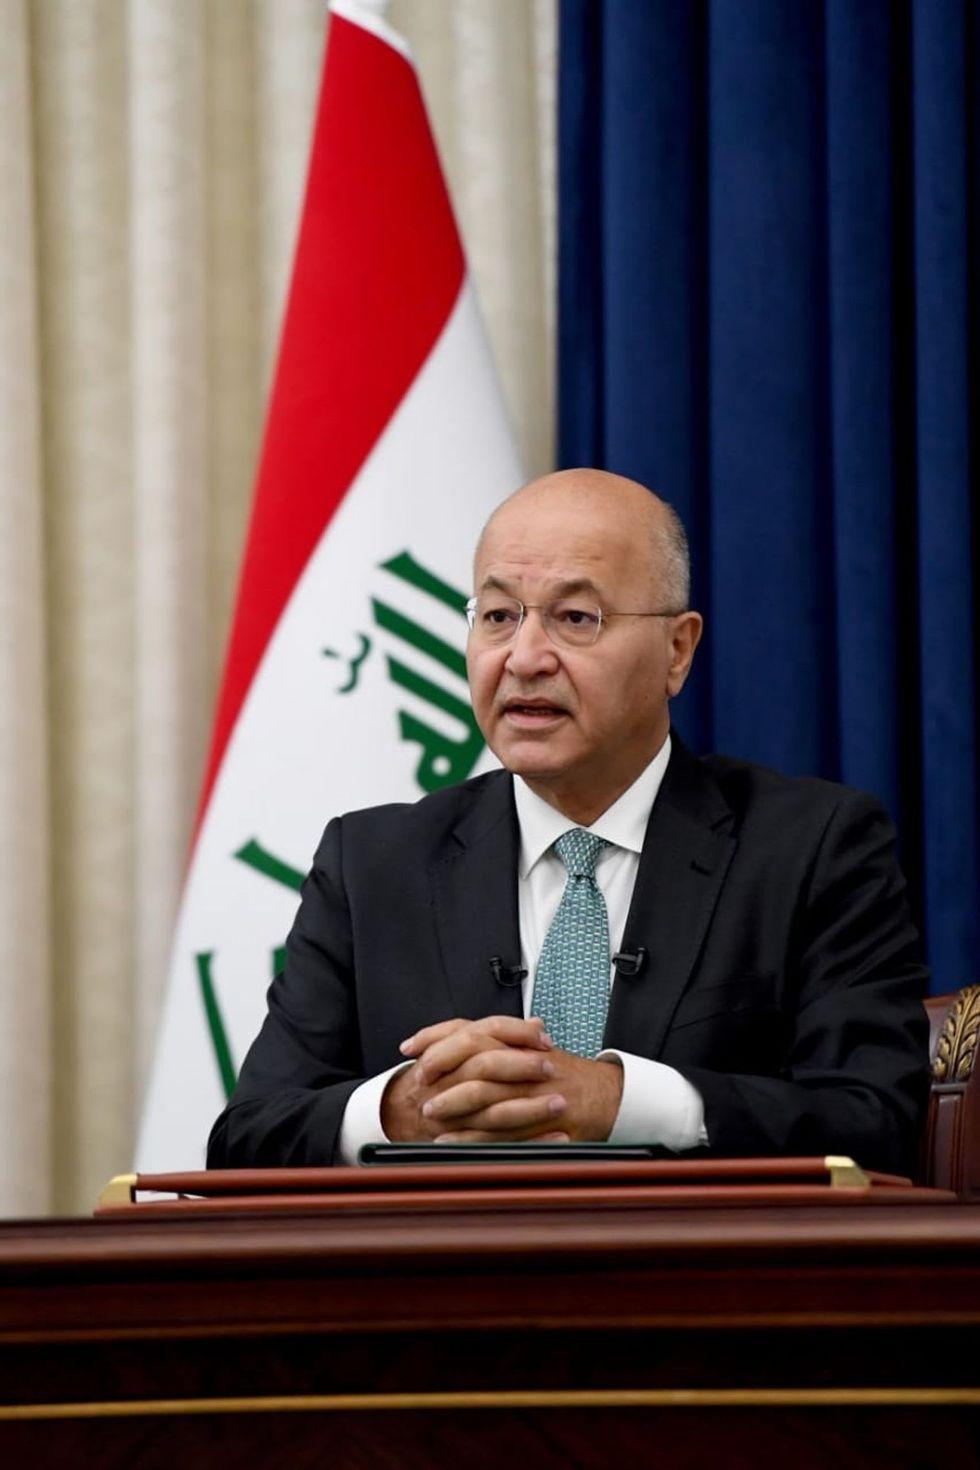 Iraq has lost 150 billion dollars due to corruption: president